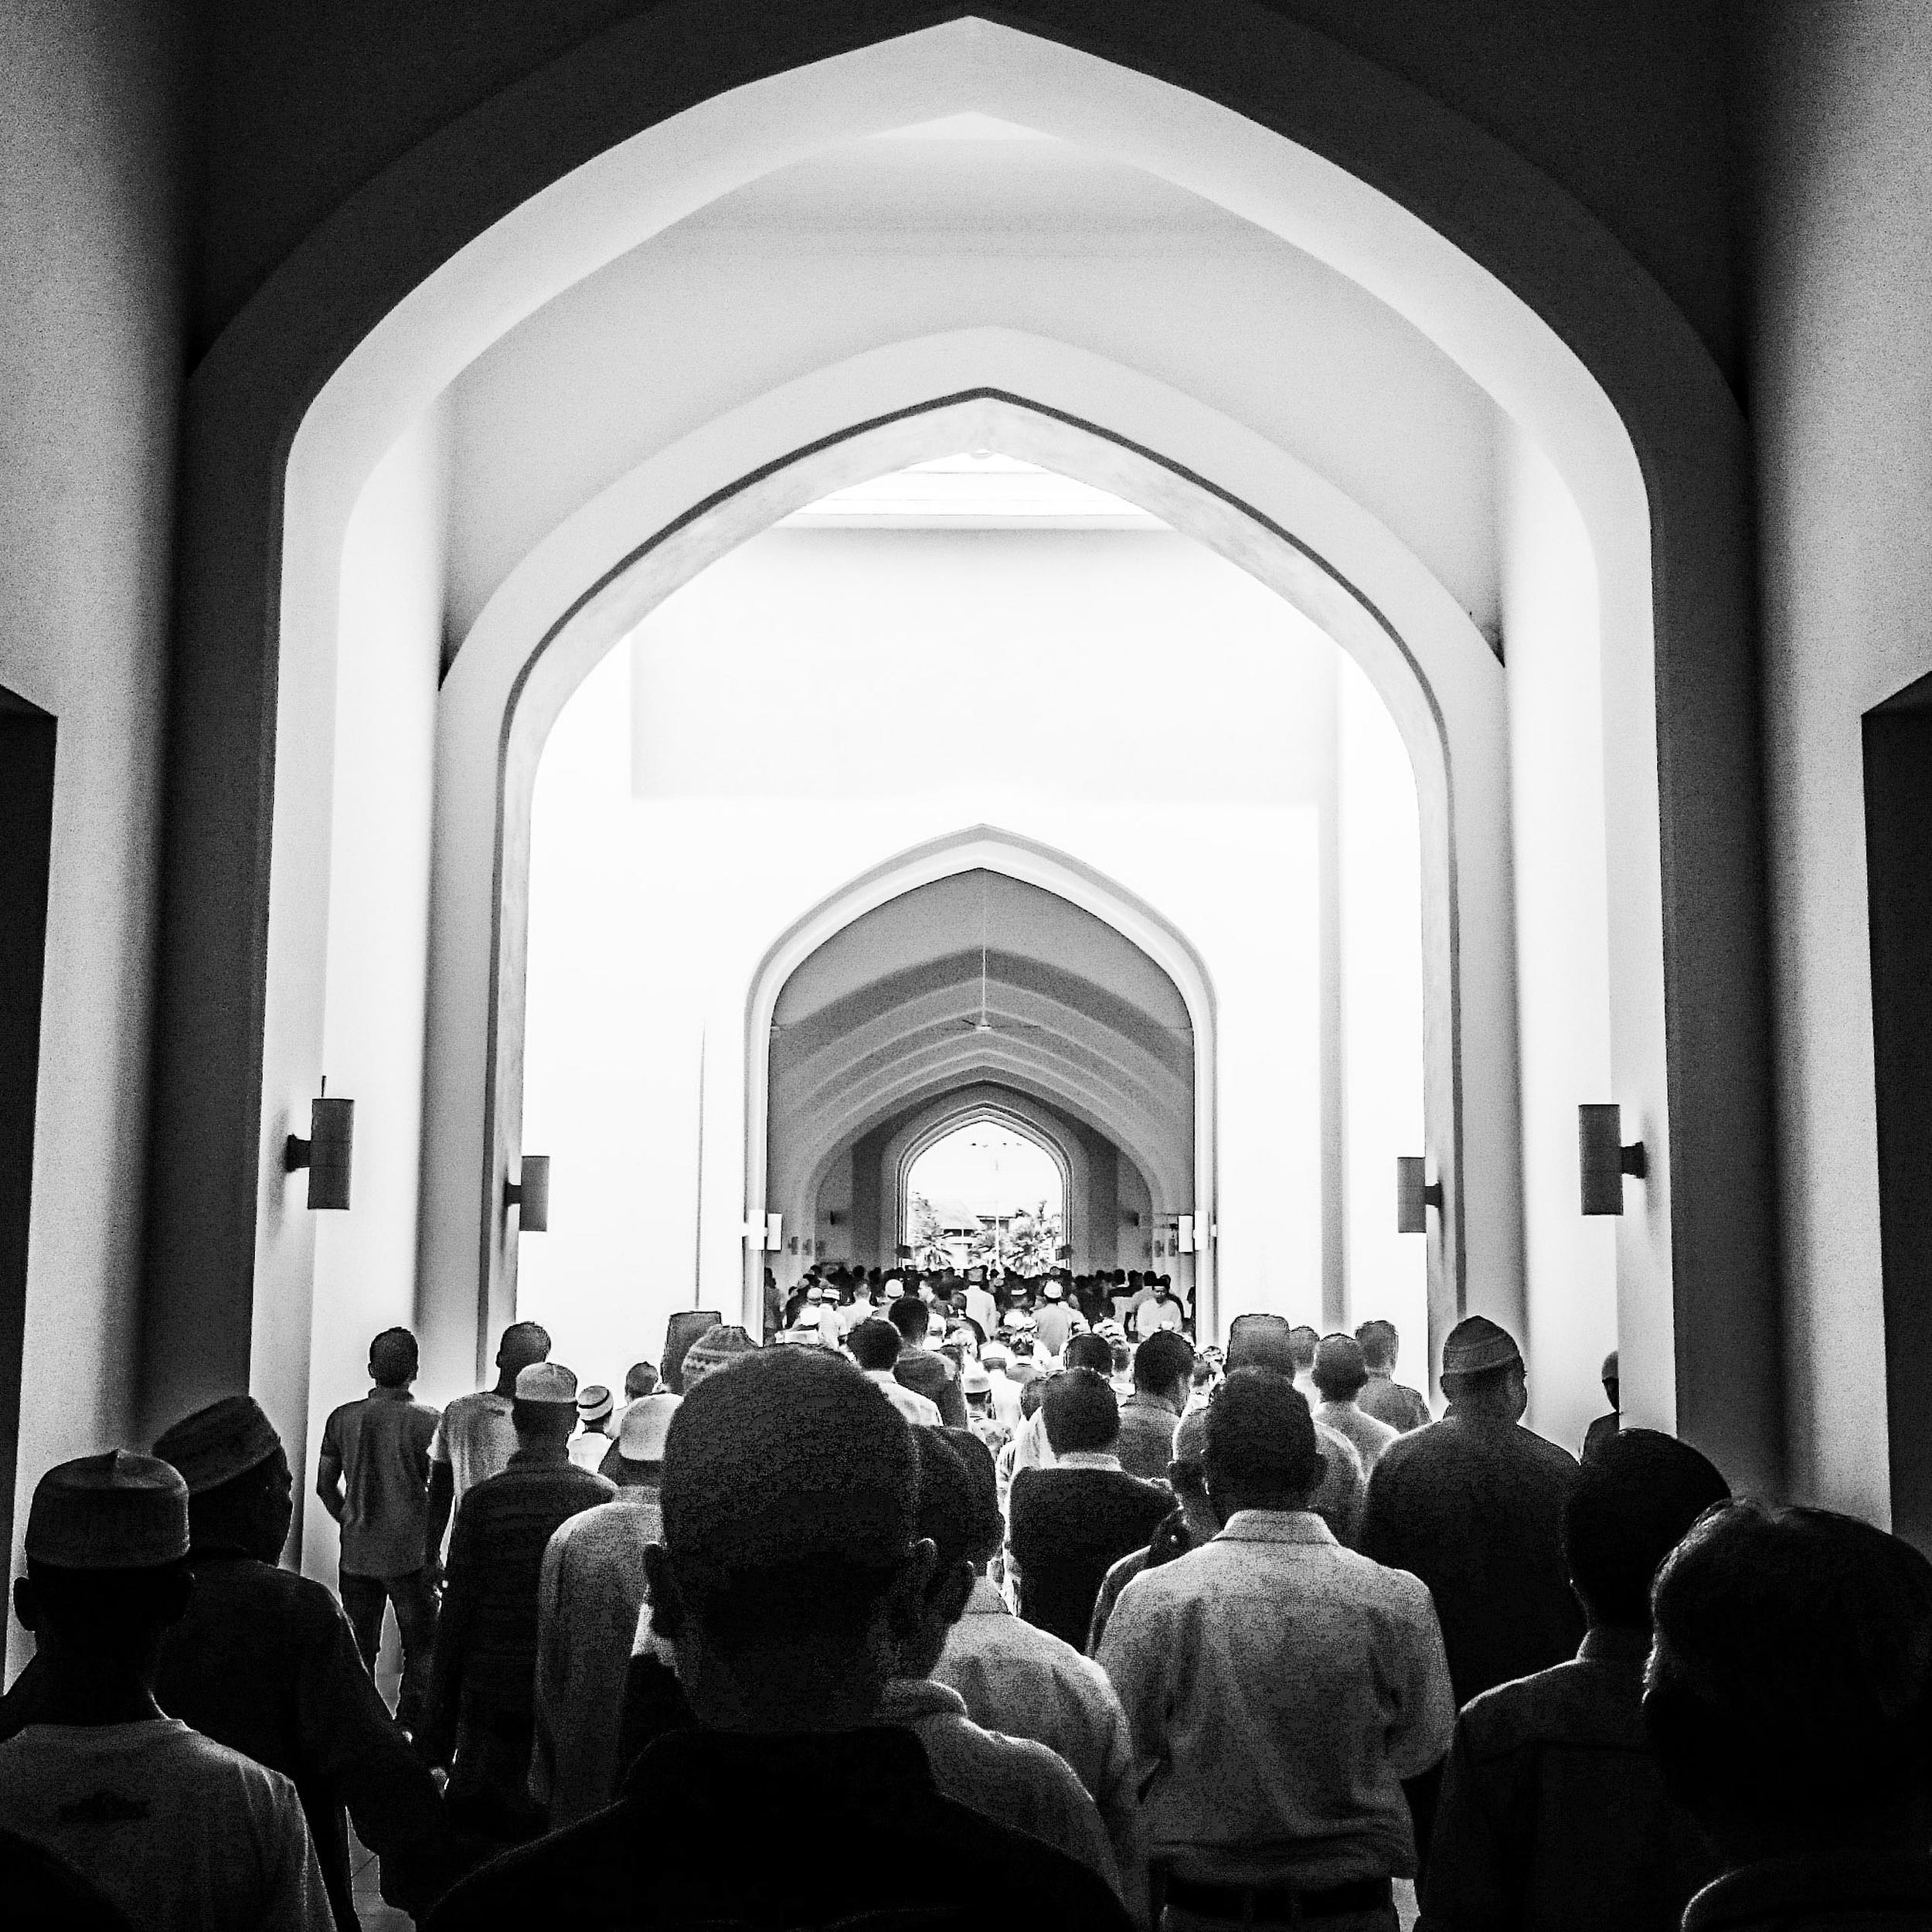 The congregants pray in Kuala Lumpur, Malaysia. (Zulfadhli Zaki)